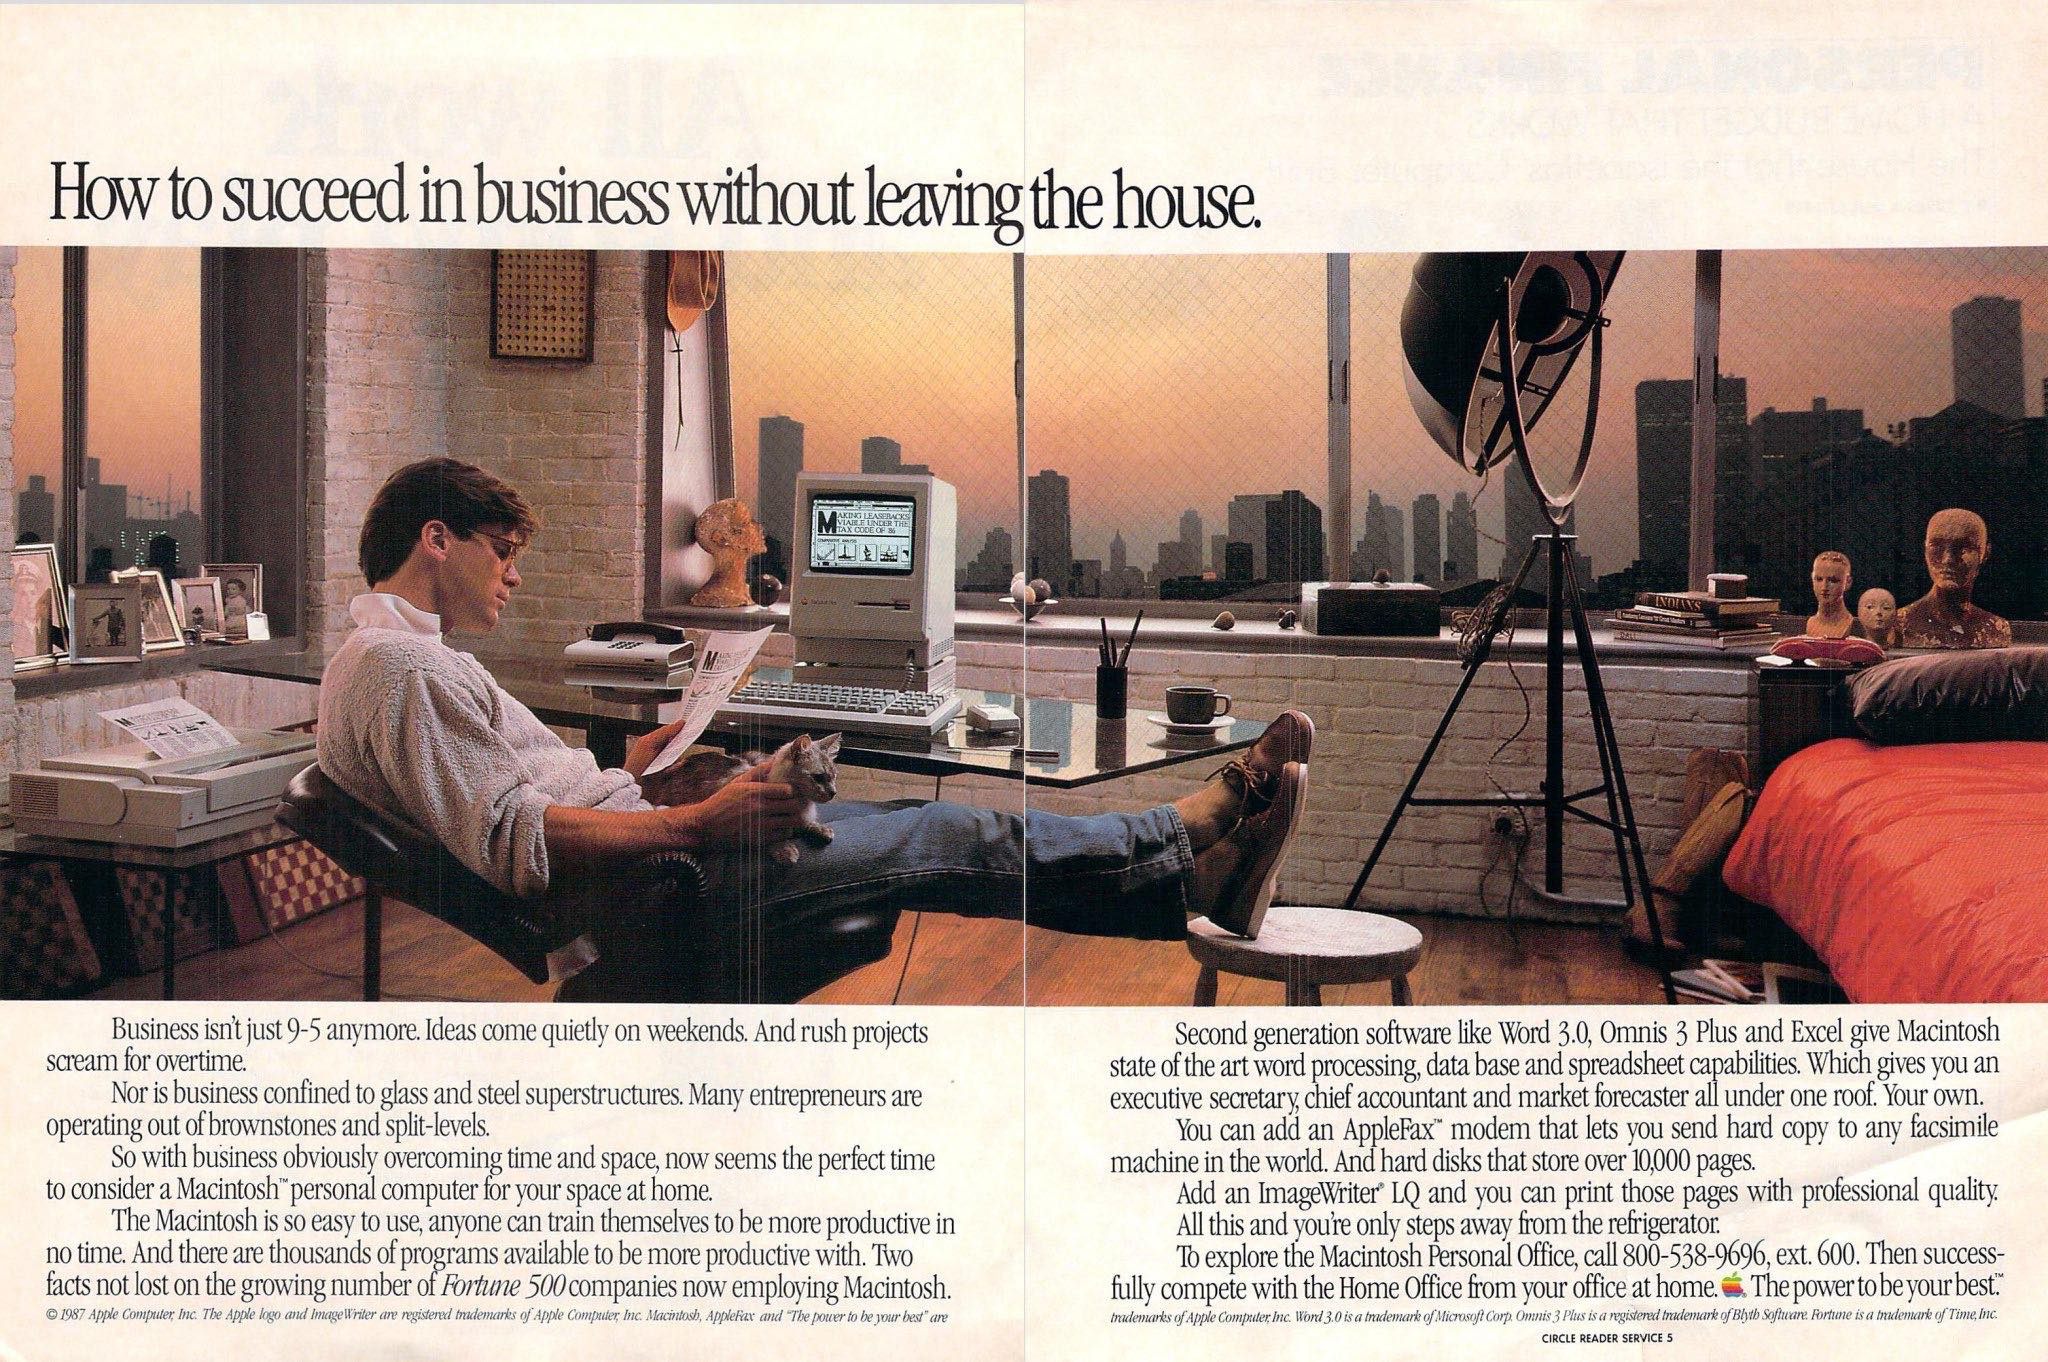 Steve Jobs - remote work & team retreats